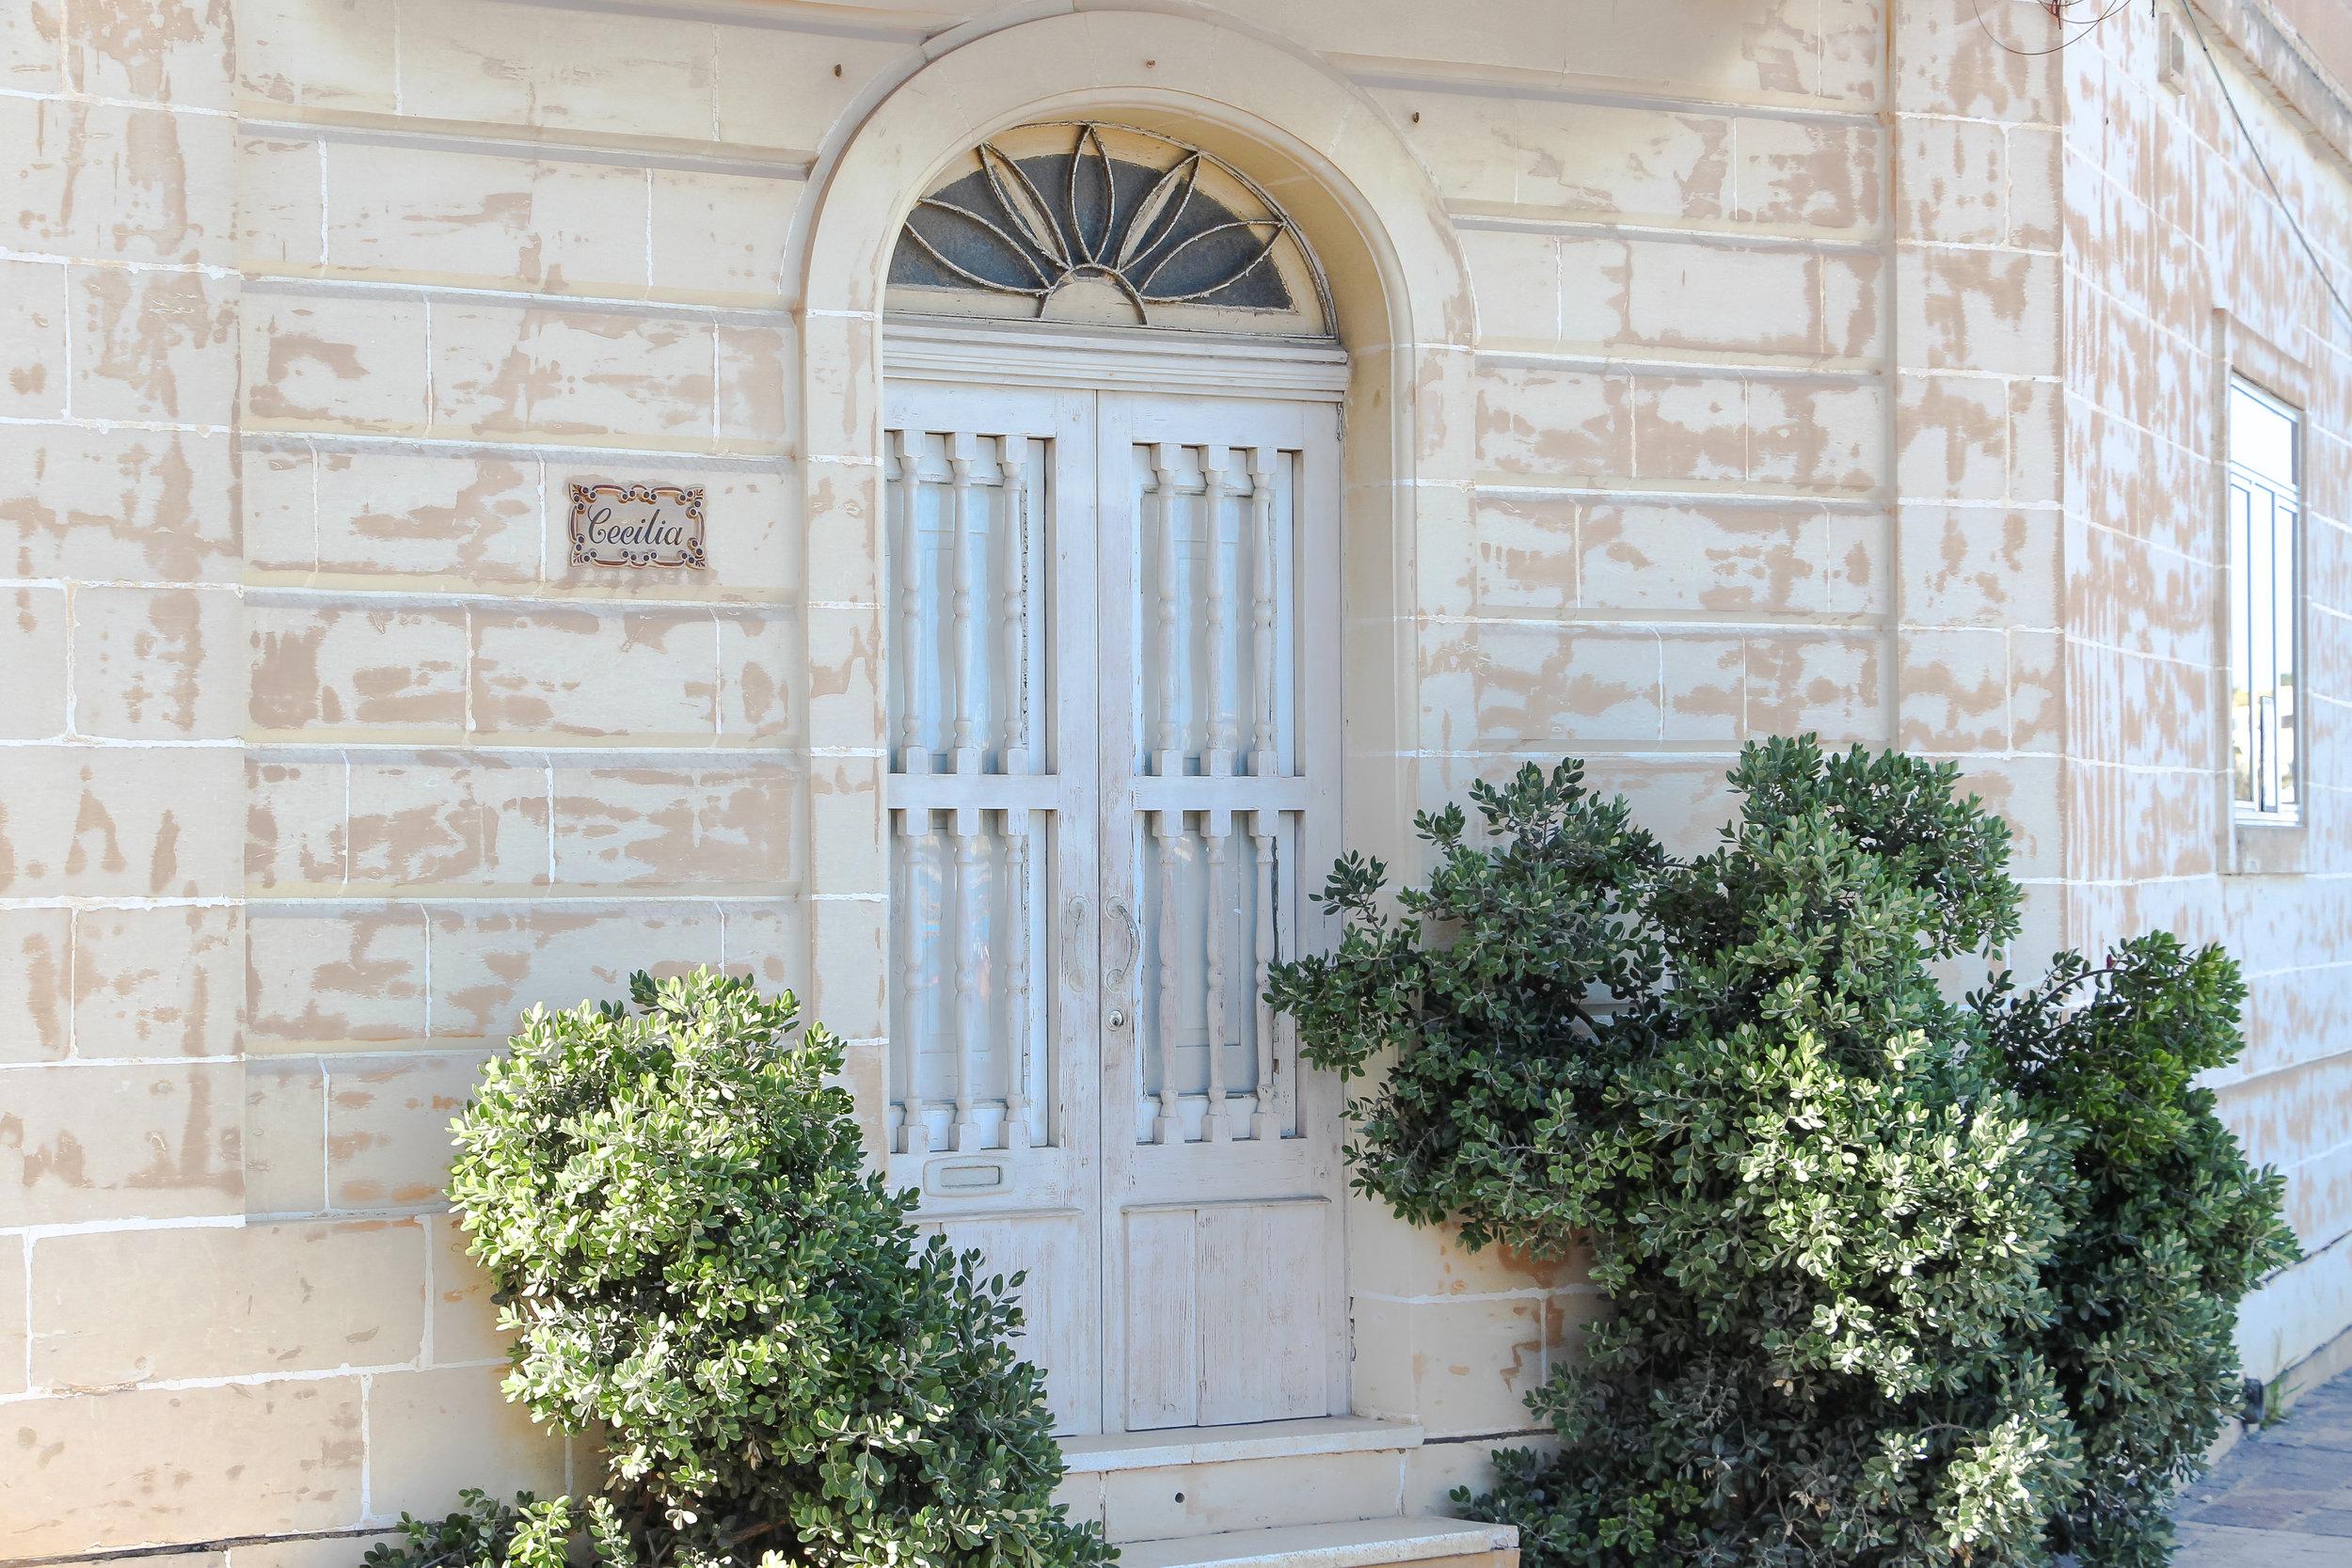 Maltese Architecture | Traditional Fishing Village | Mediterranean Sea | Marsaxlokk - Thinking About Appreciation For Quality In Malta | Malta, Europe | DoLessGetMoreDone.com | - Canon Minimal Travel Documentary Photography - search for Liveability | Sustainability